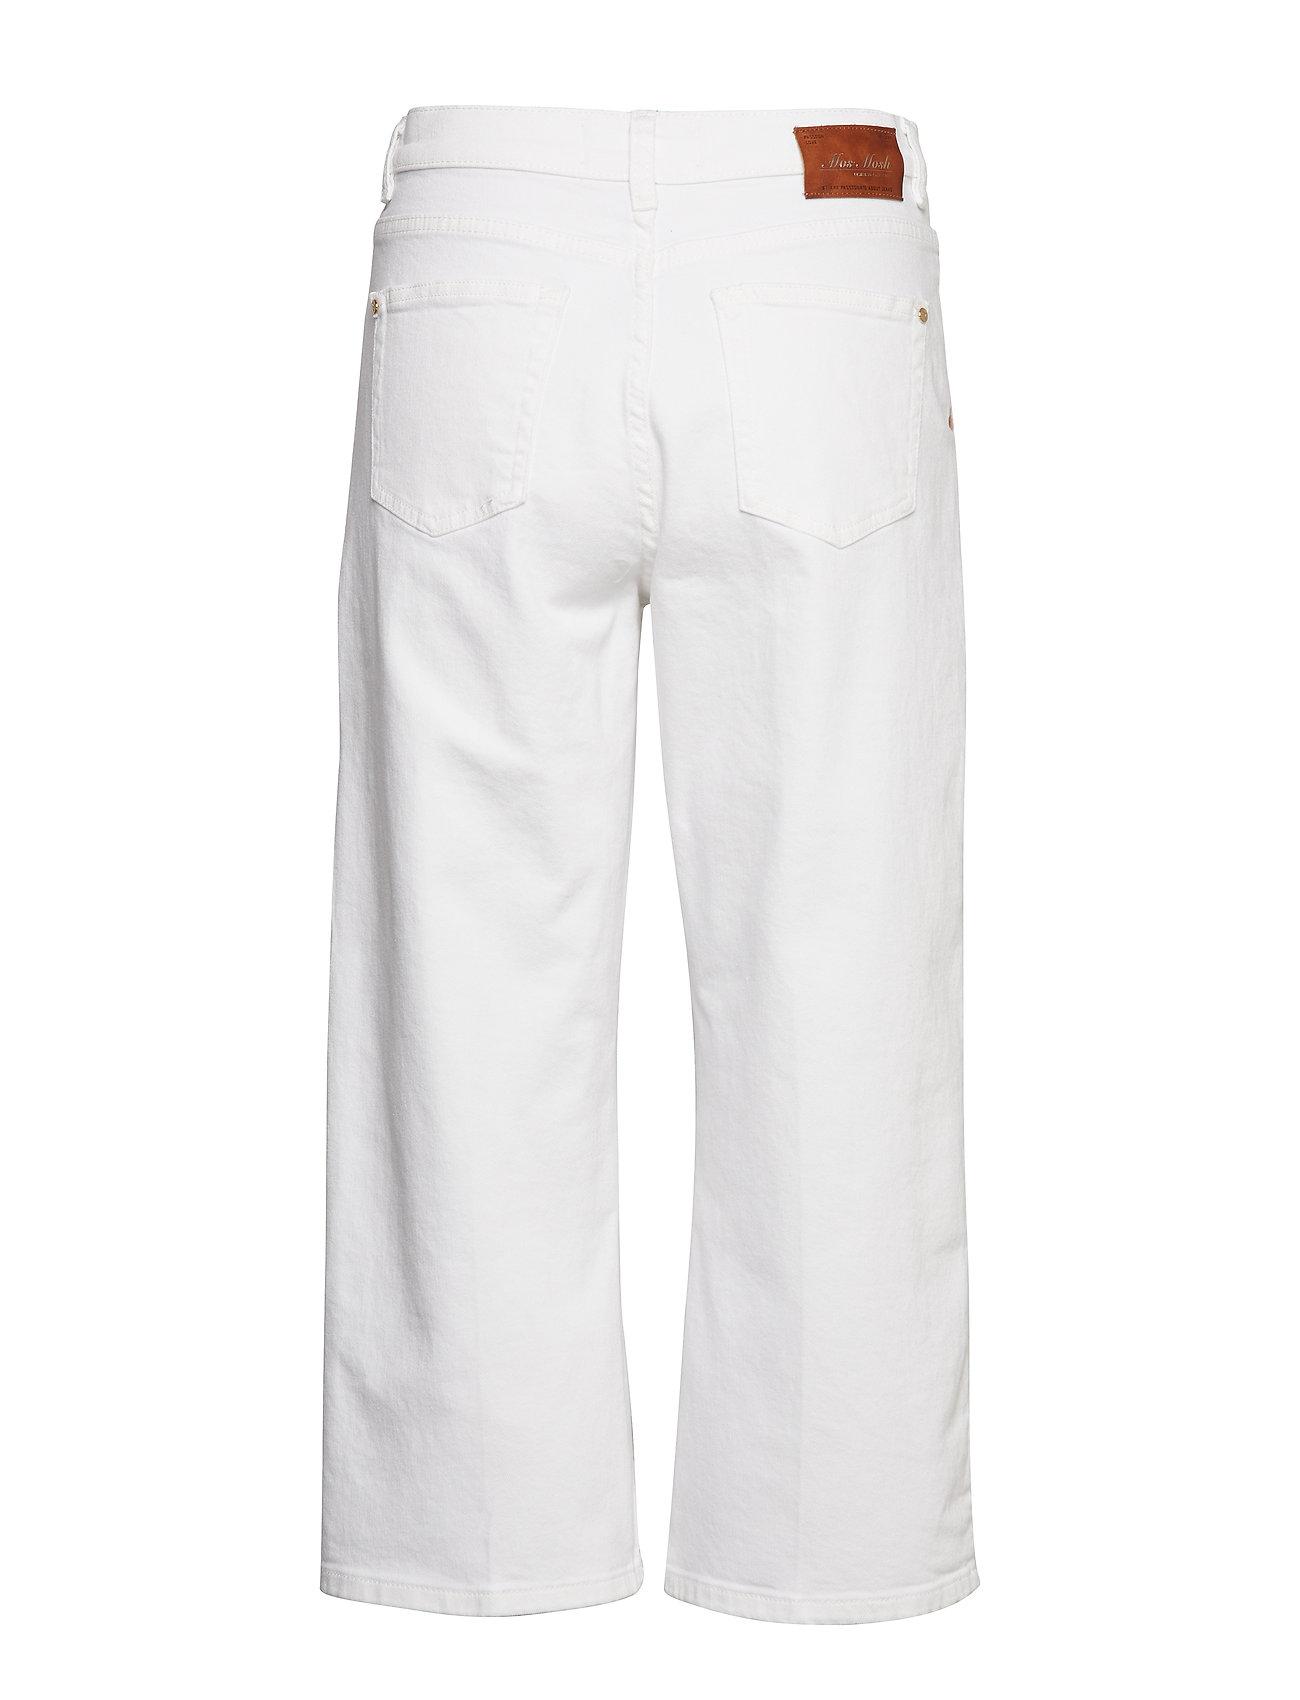 MOS MOSH    Cora Culotte Jeans  - Jeans    WHITE DENIM